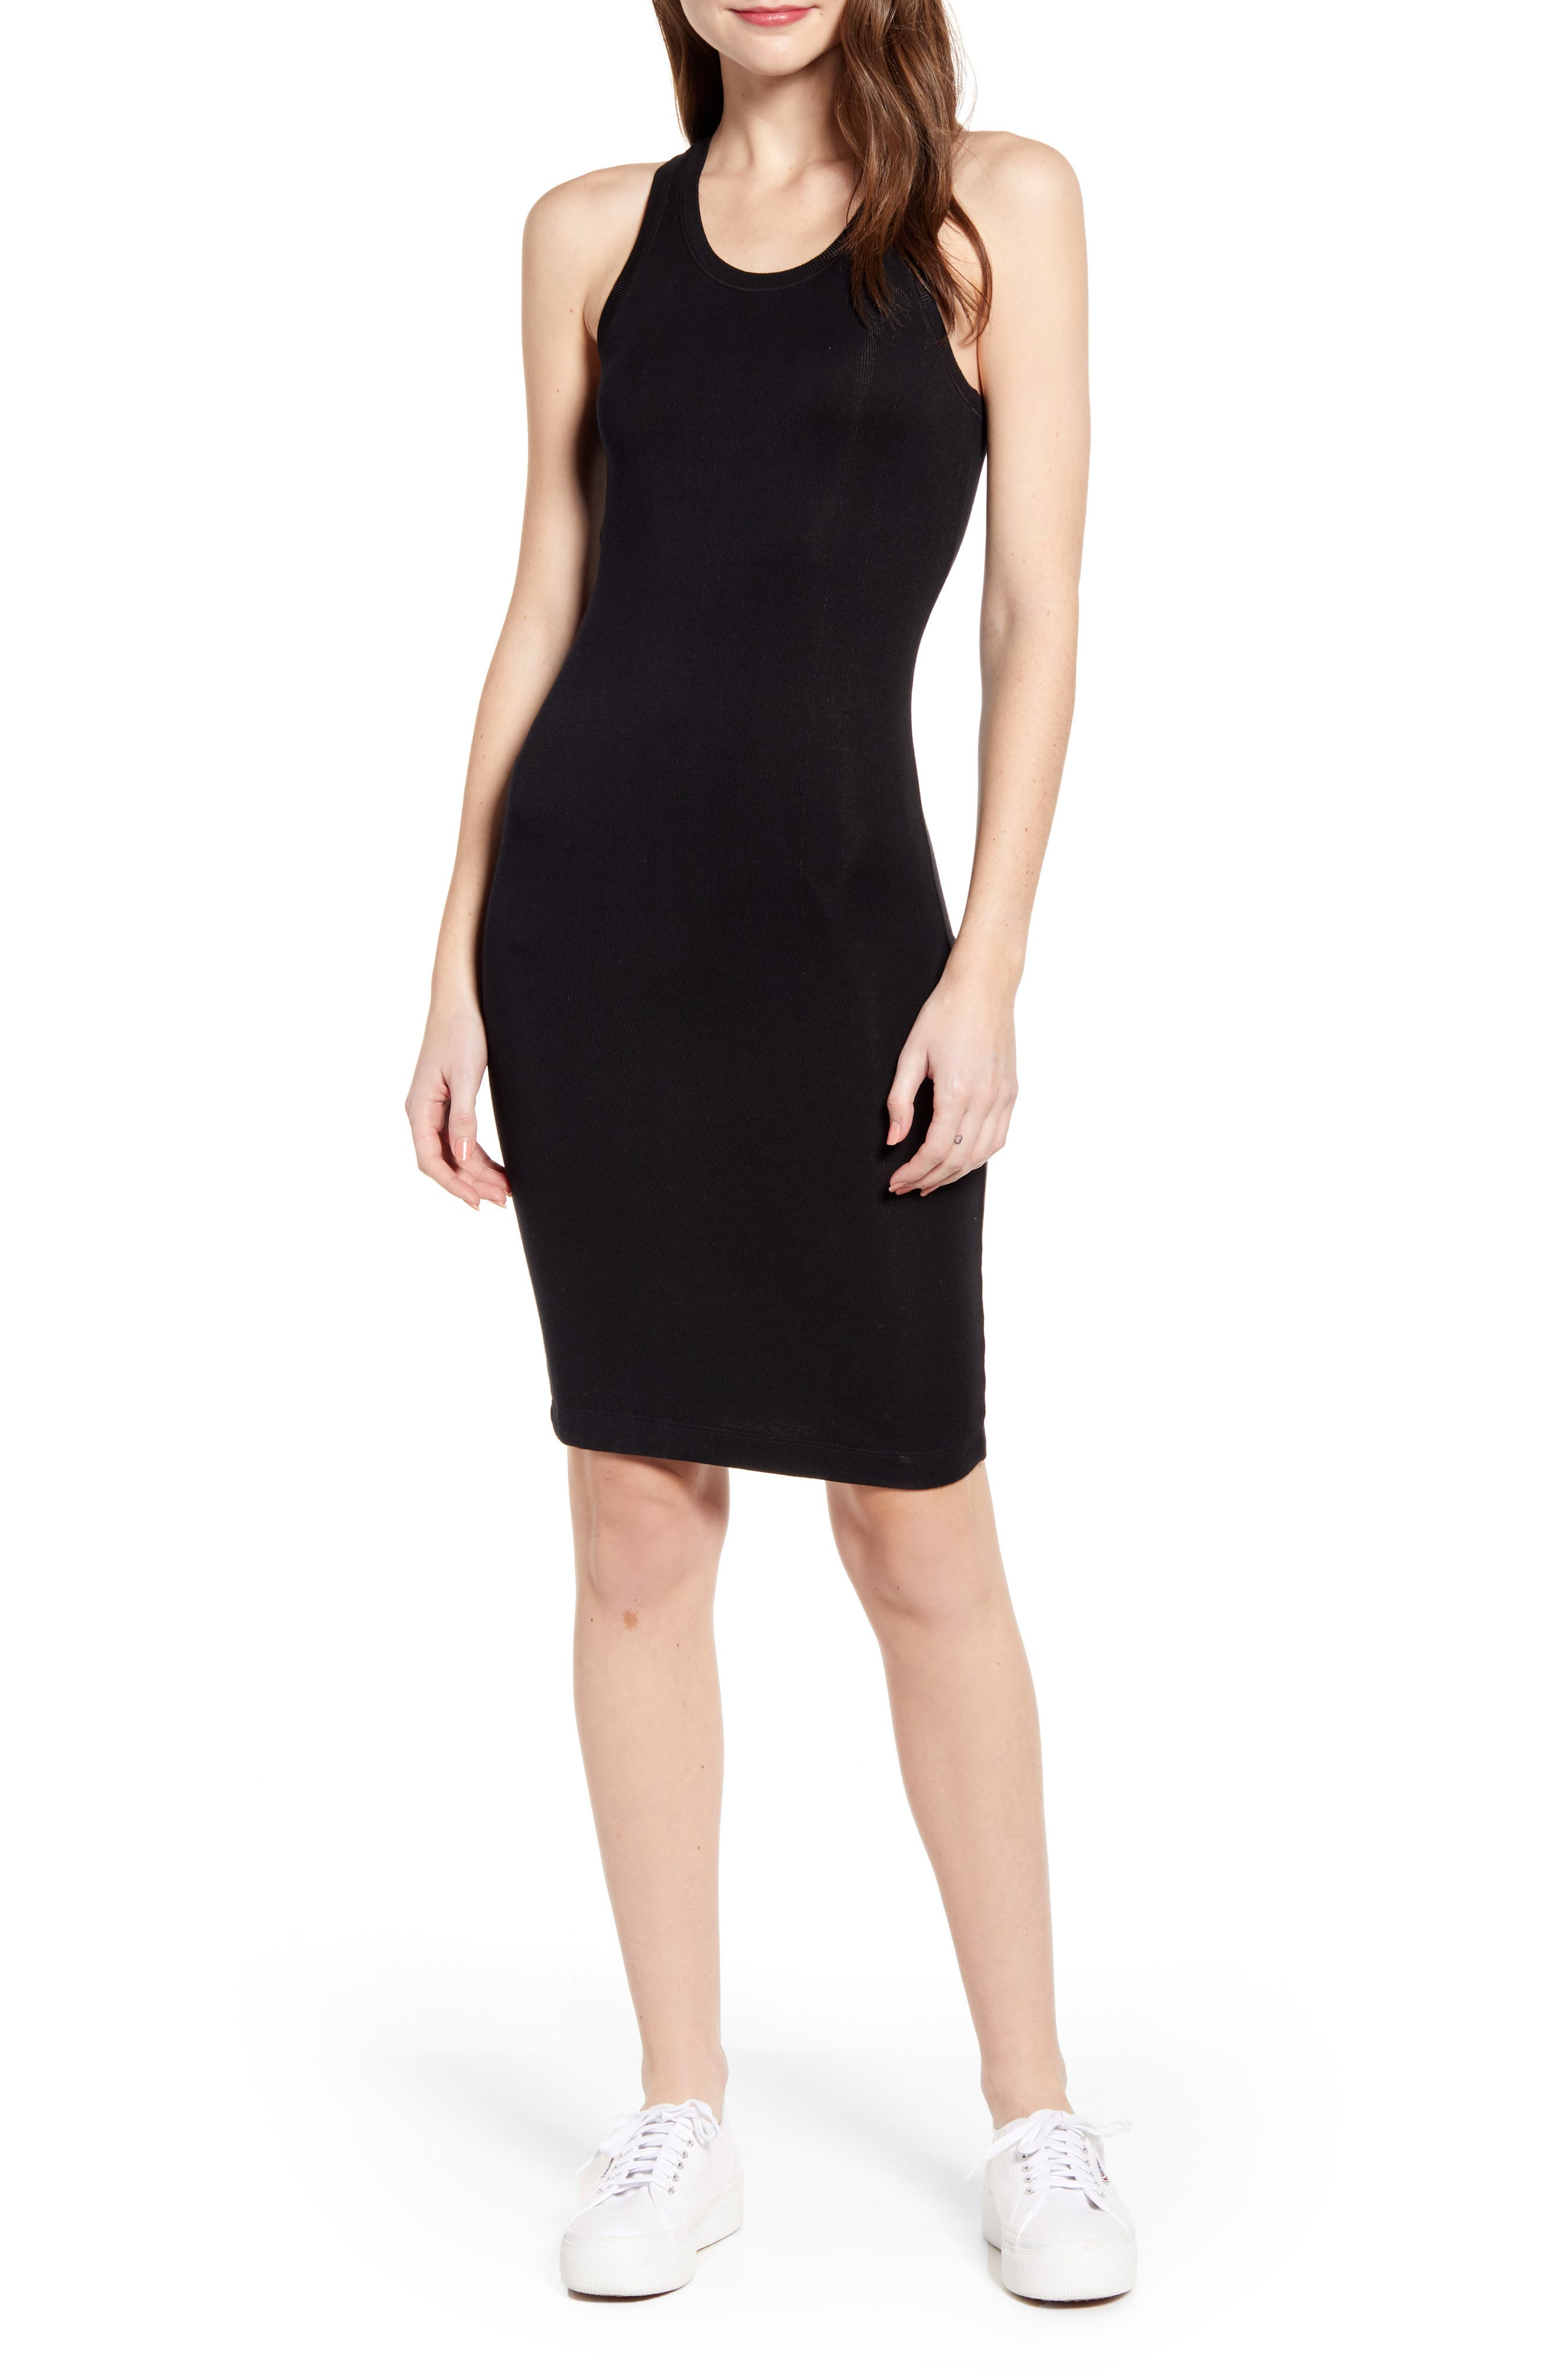 Splendid Racerback Knit Dress, Black